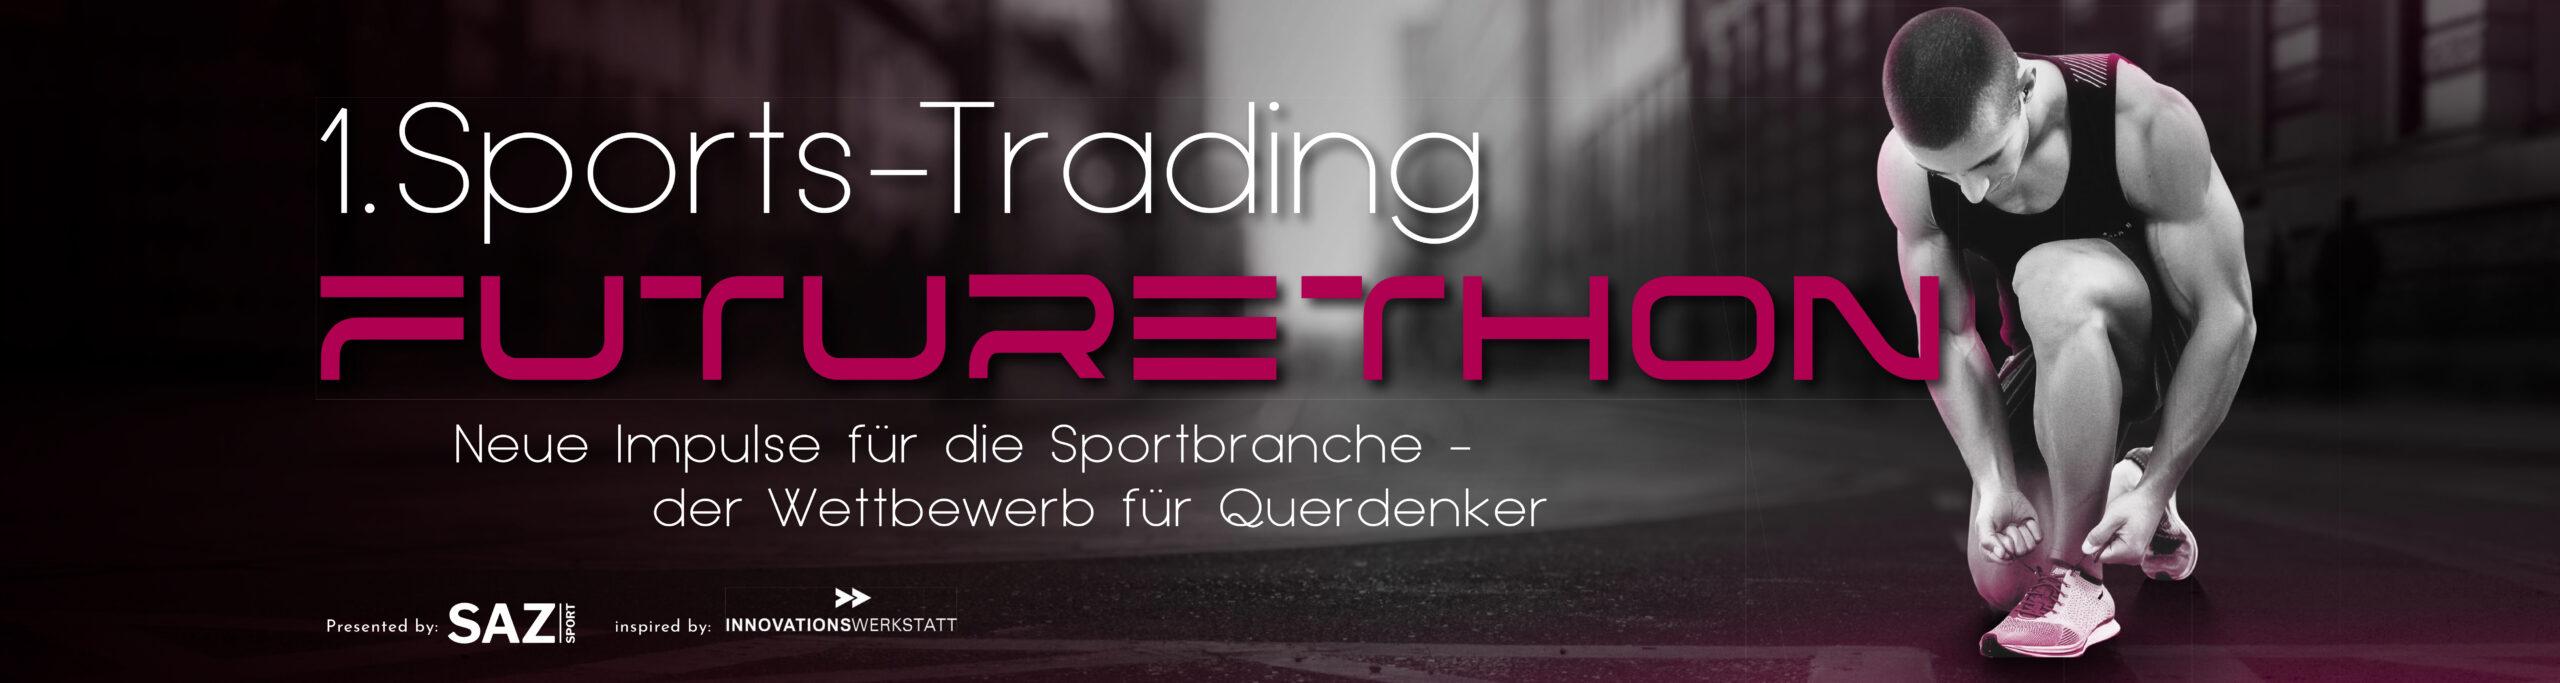 Sports Trading Futurethon